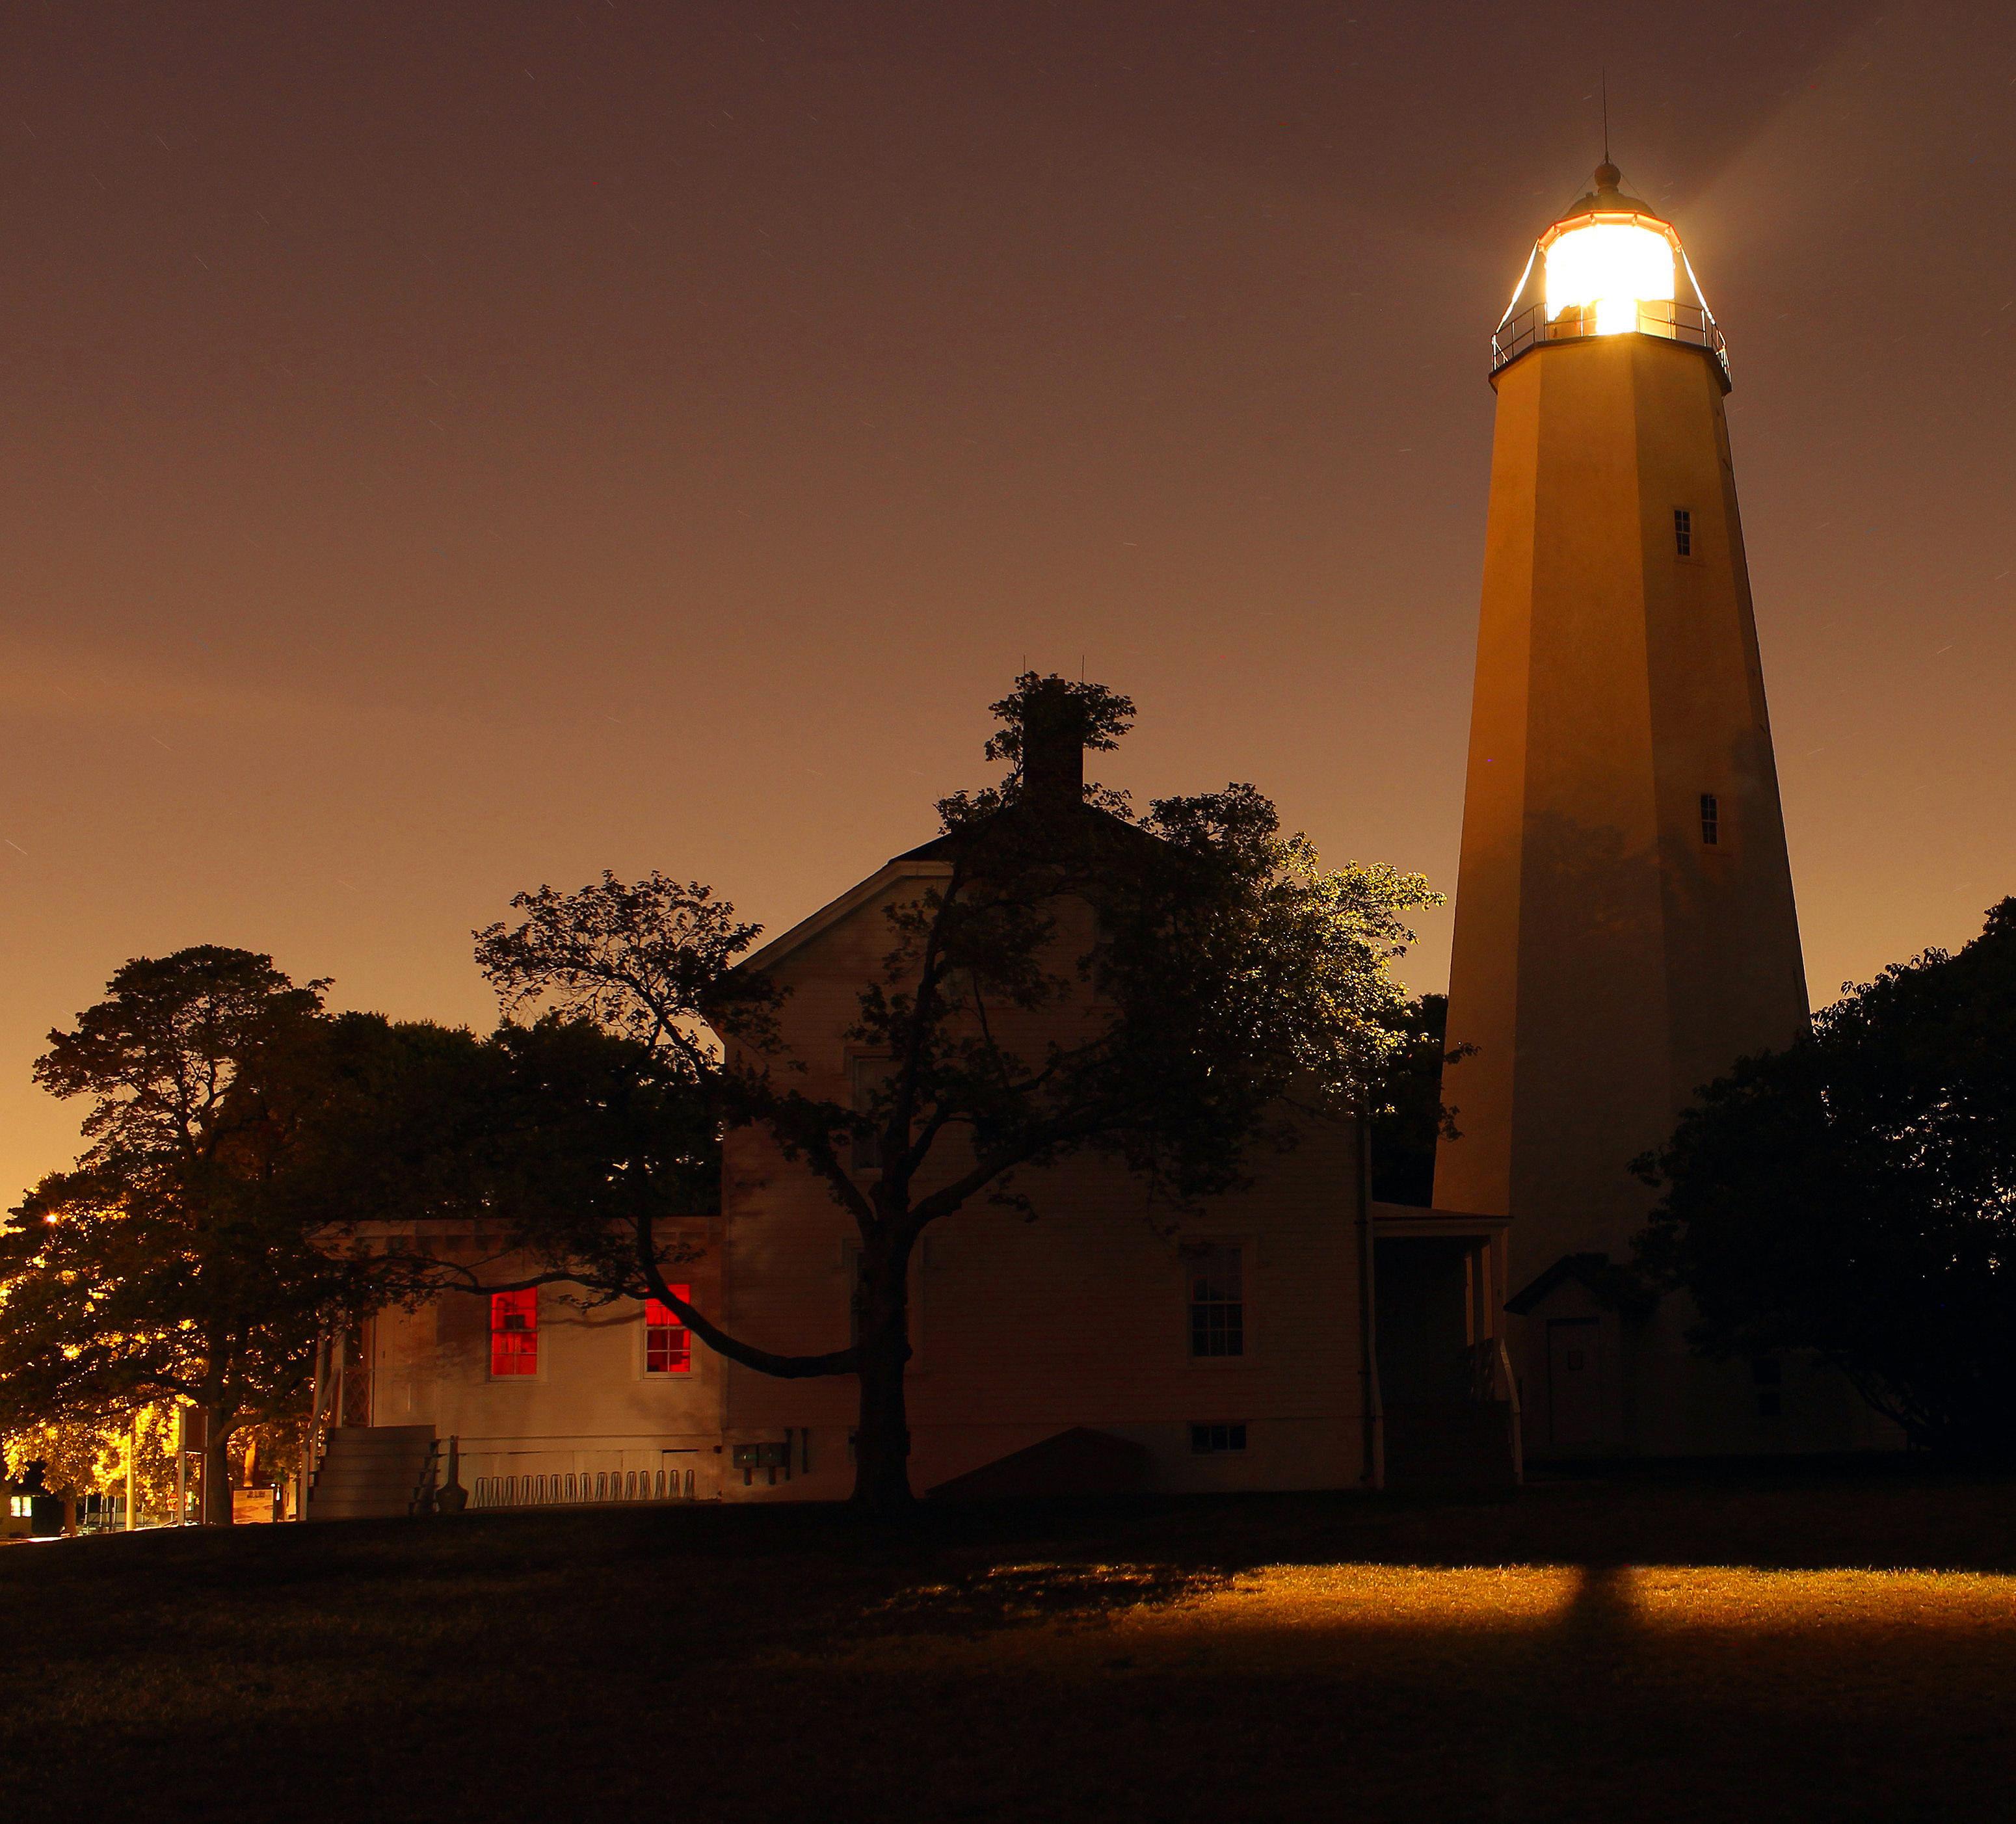 a573df31b0f595189a47_sandy_hook_lighthouse.jpg